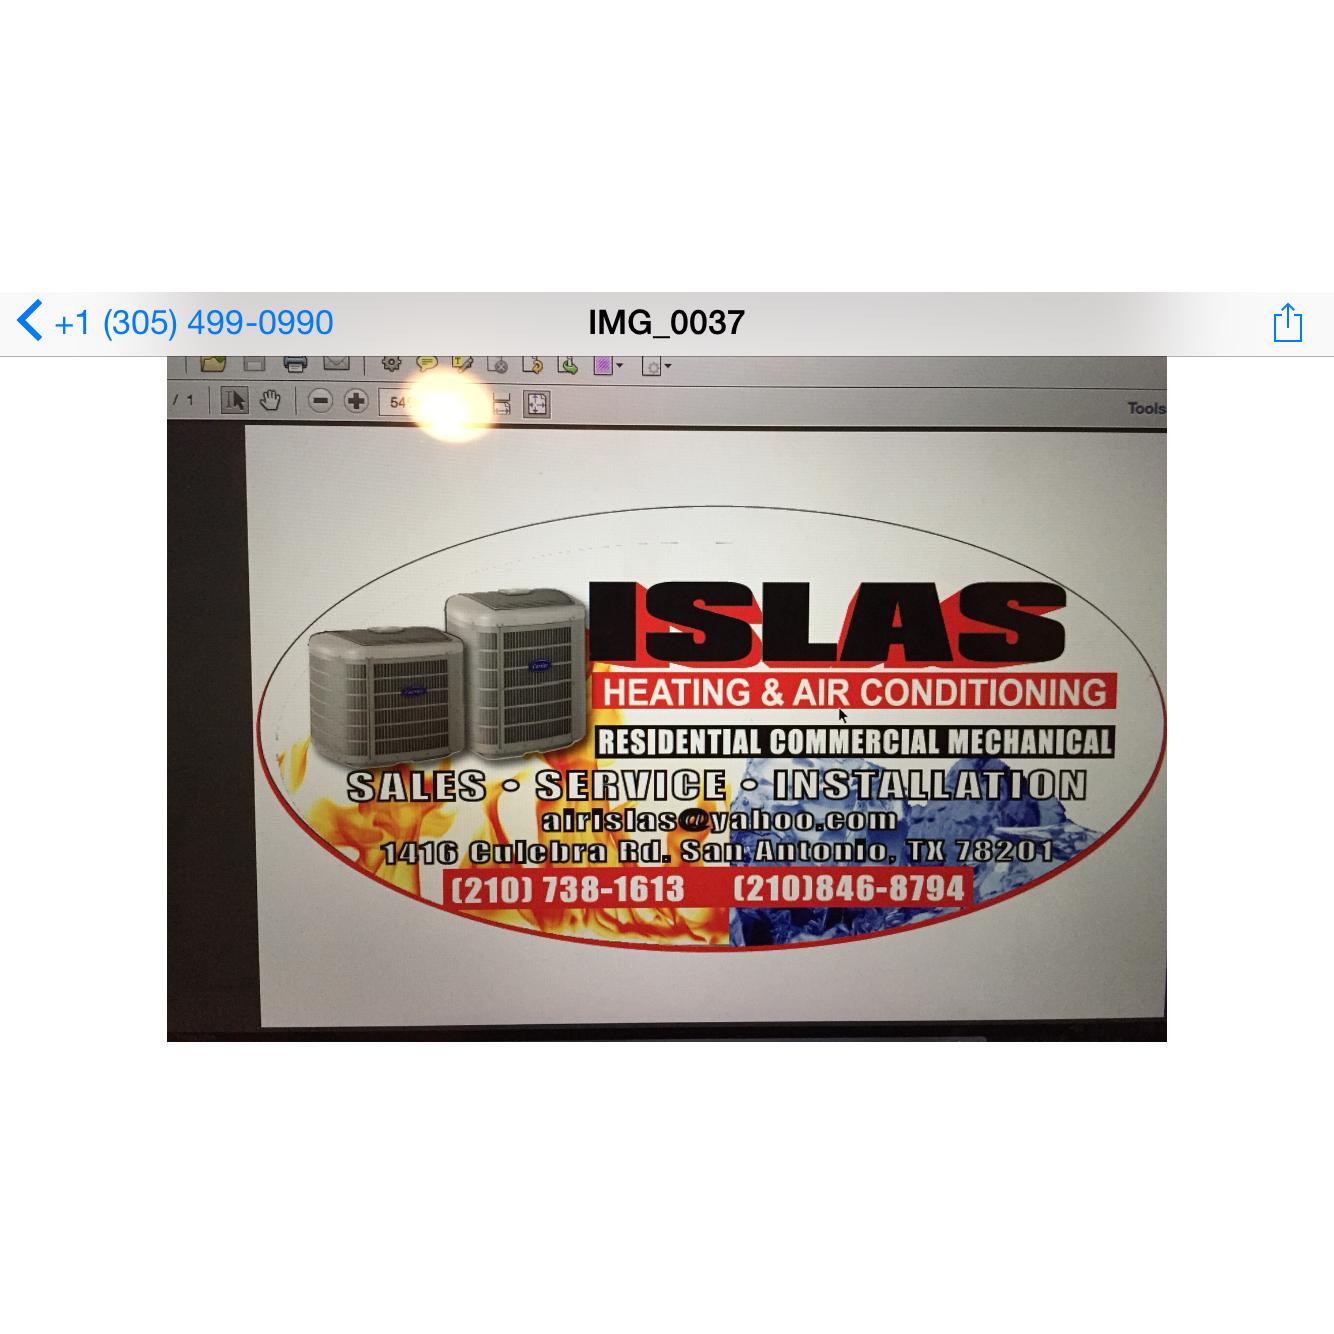 Islas Air Conditioning Heating TACLB61927E